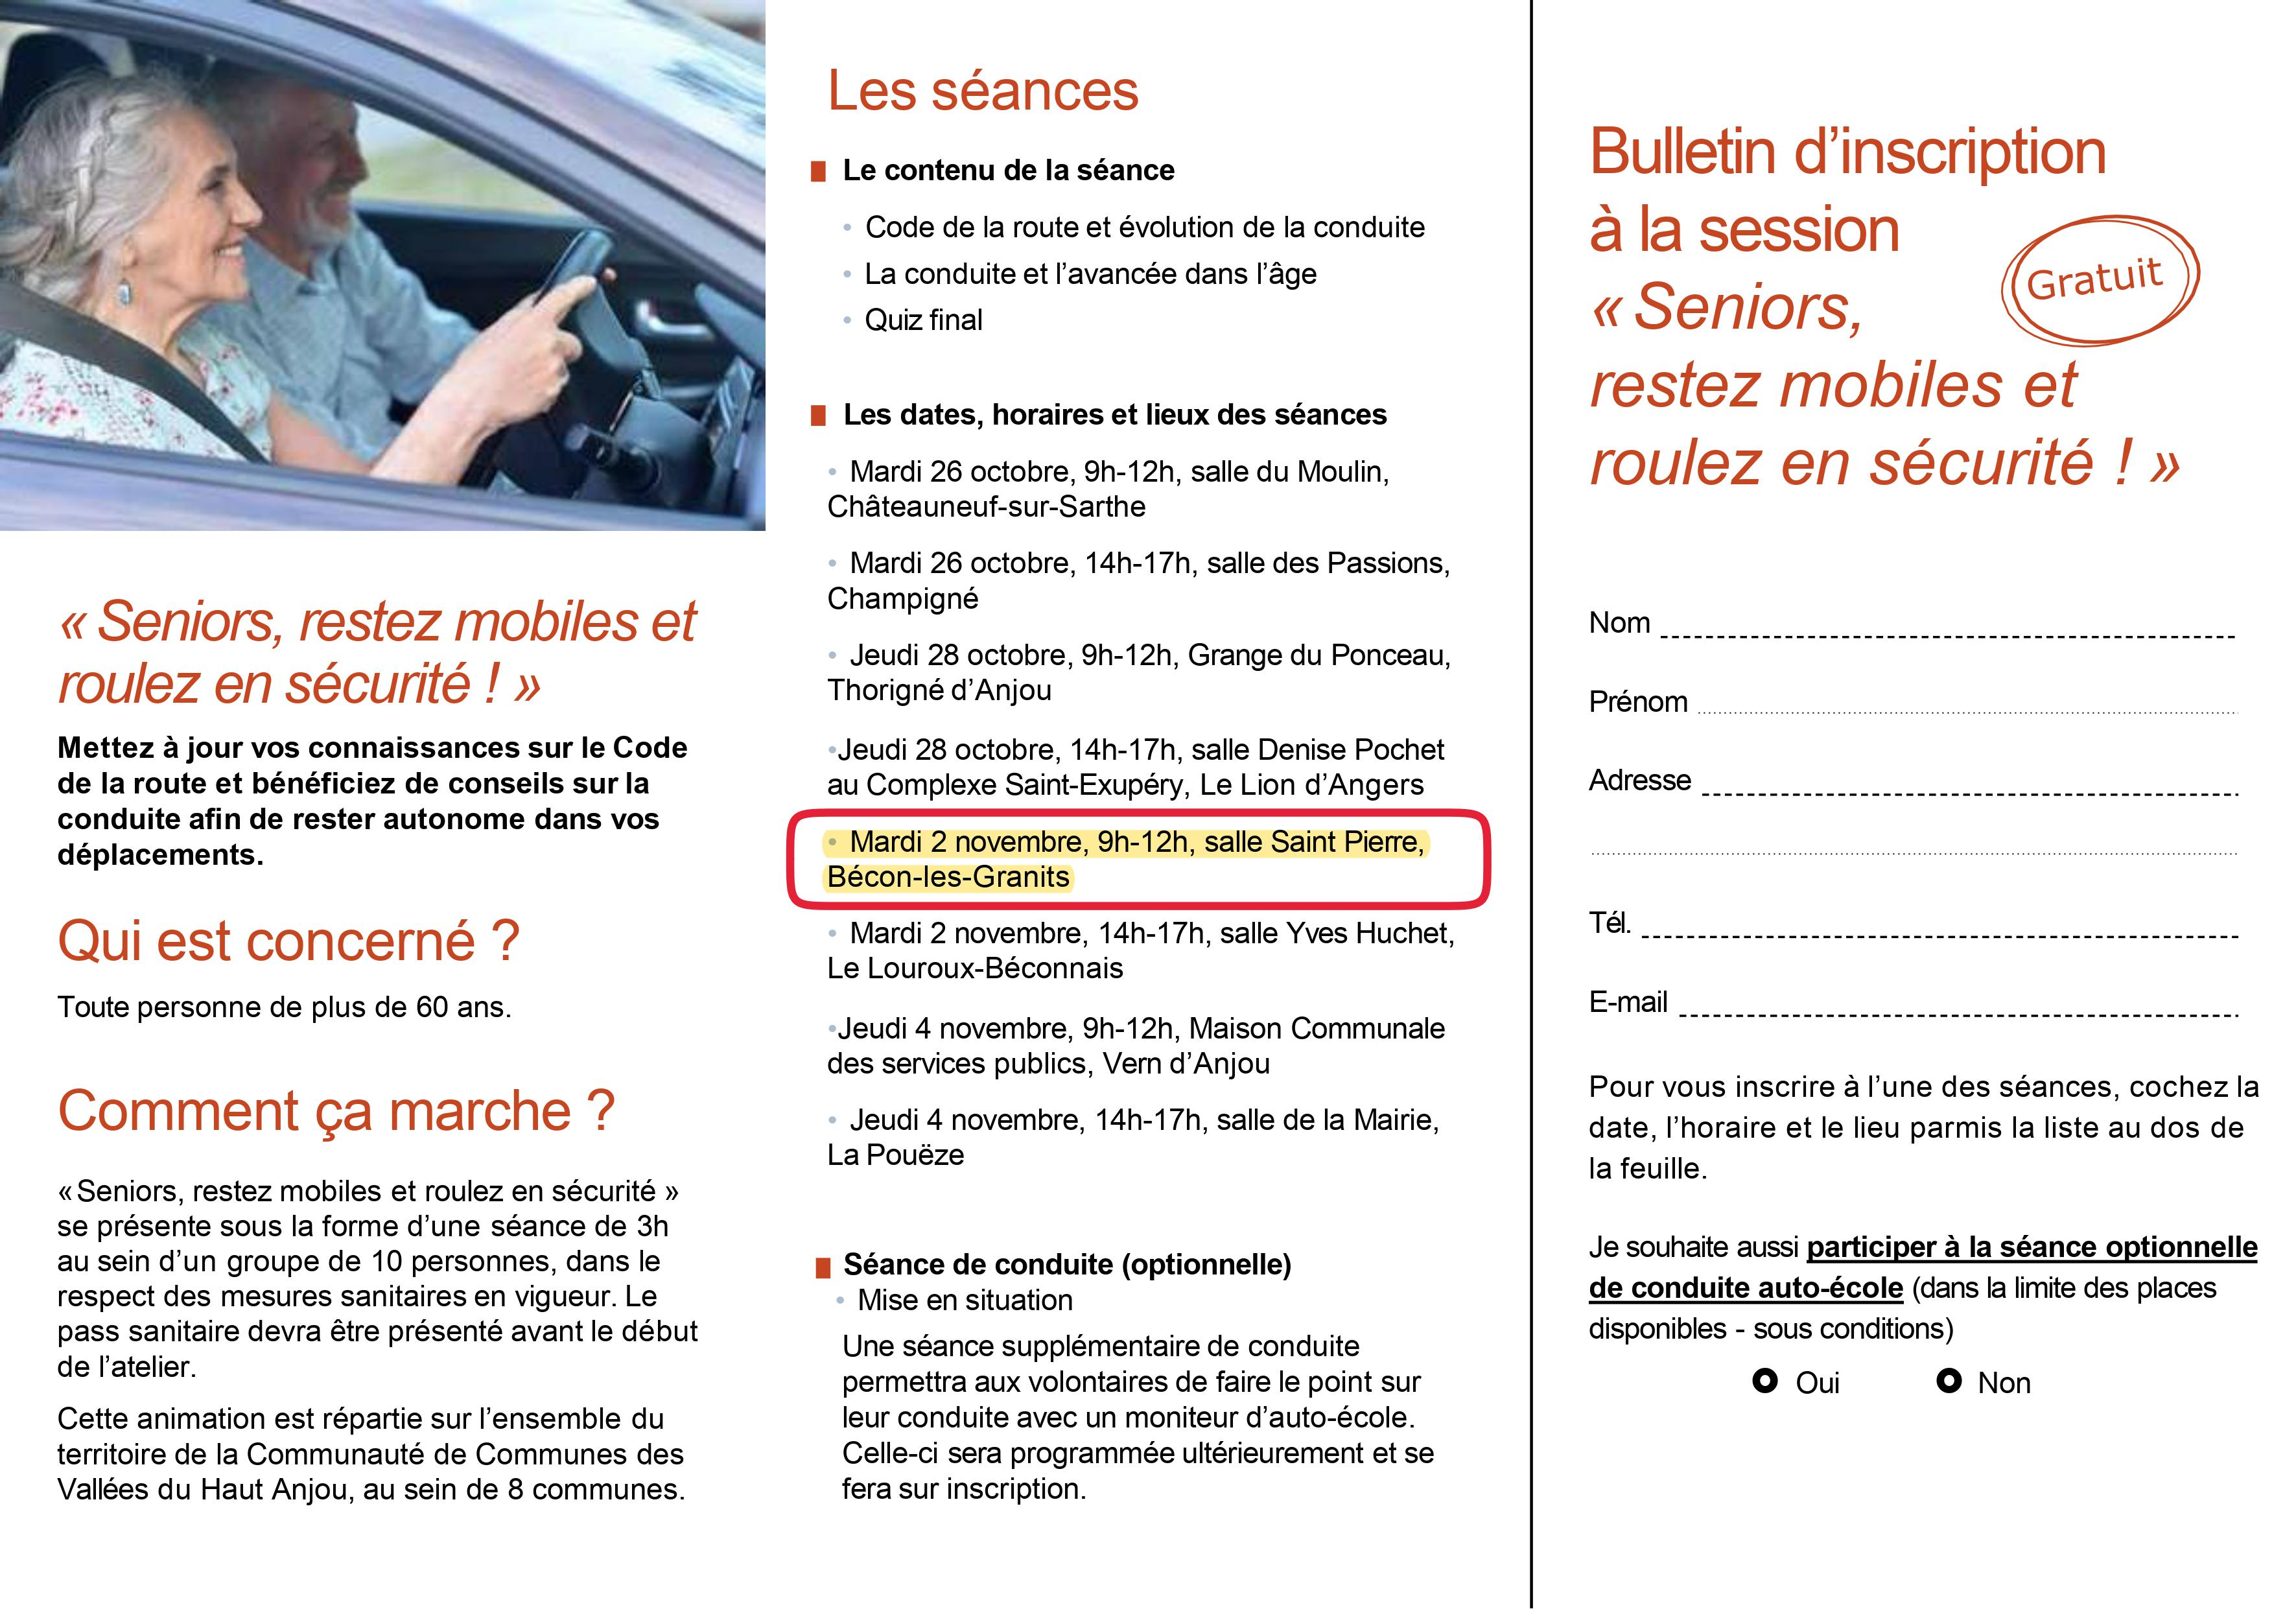 Ateliers_Seniors_restez_mobiles_CIAS- 02.jpg